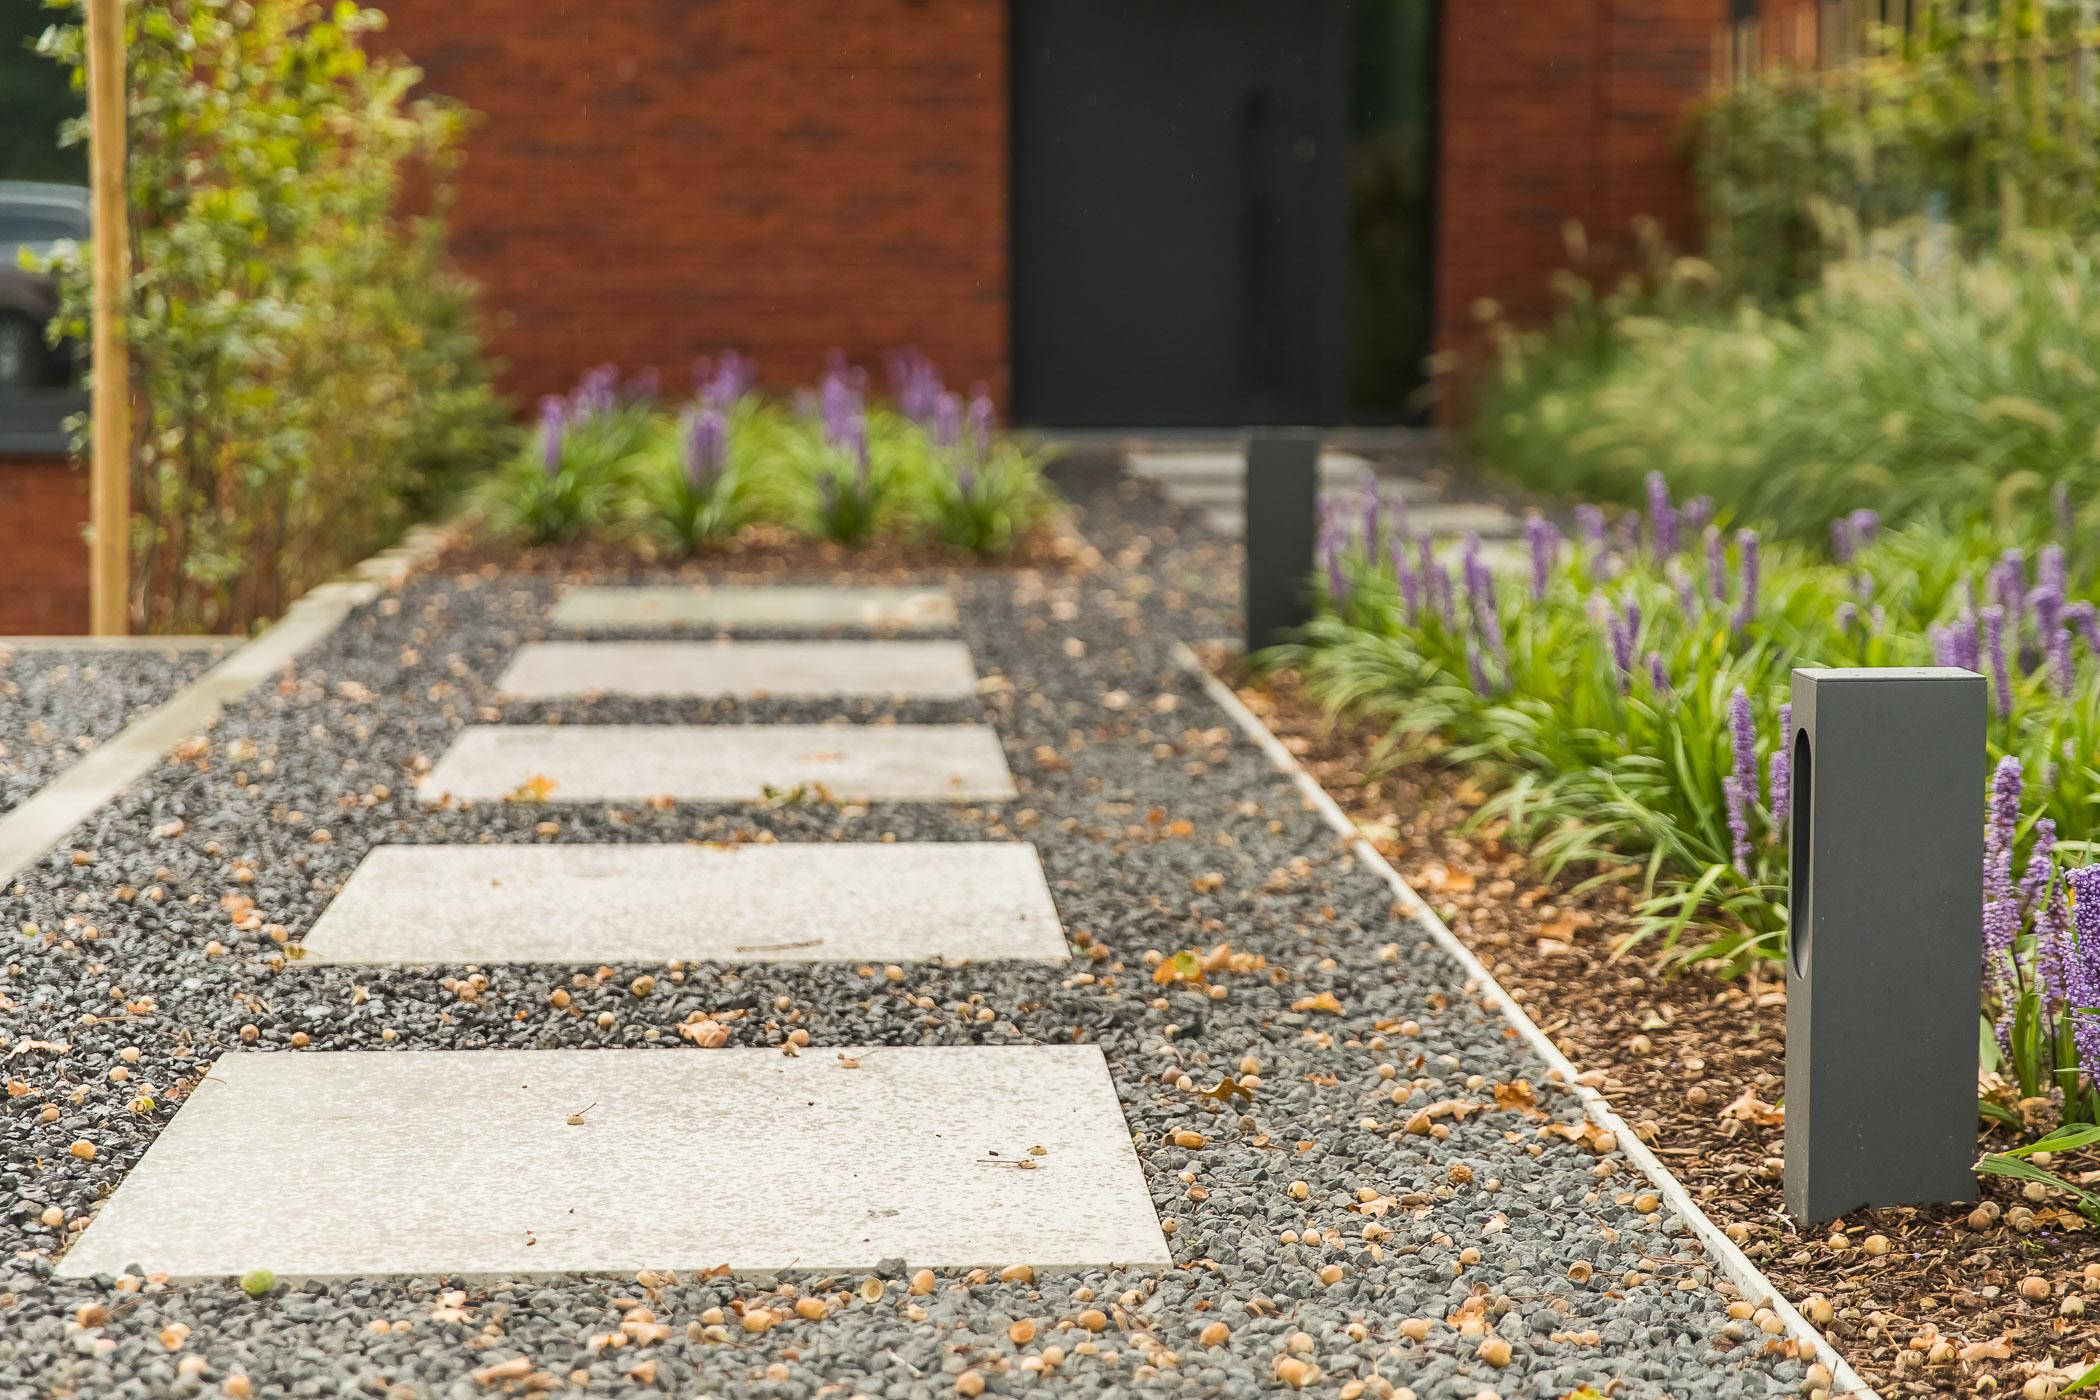 Grind Tuin Aanleggen : Grind tuin ecosia